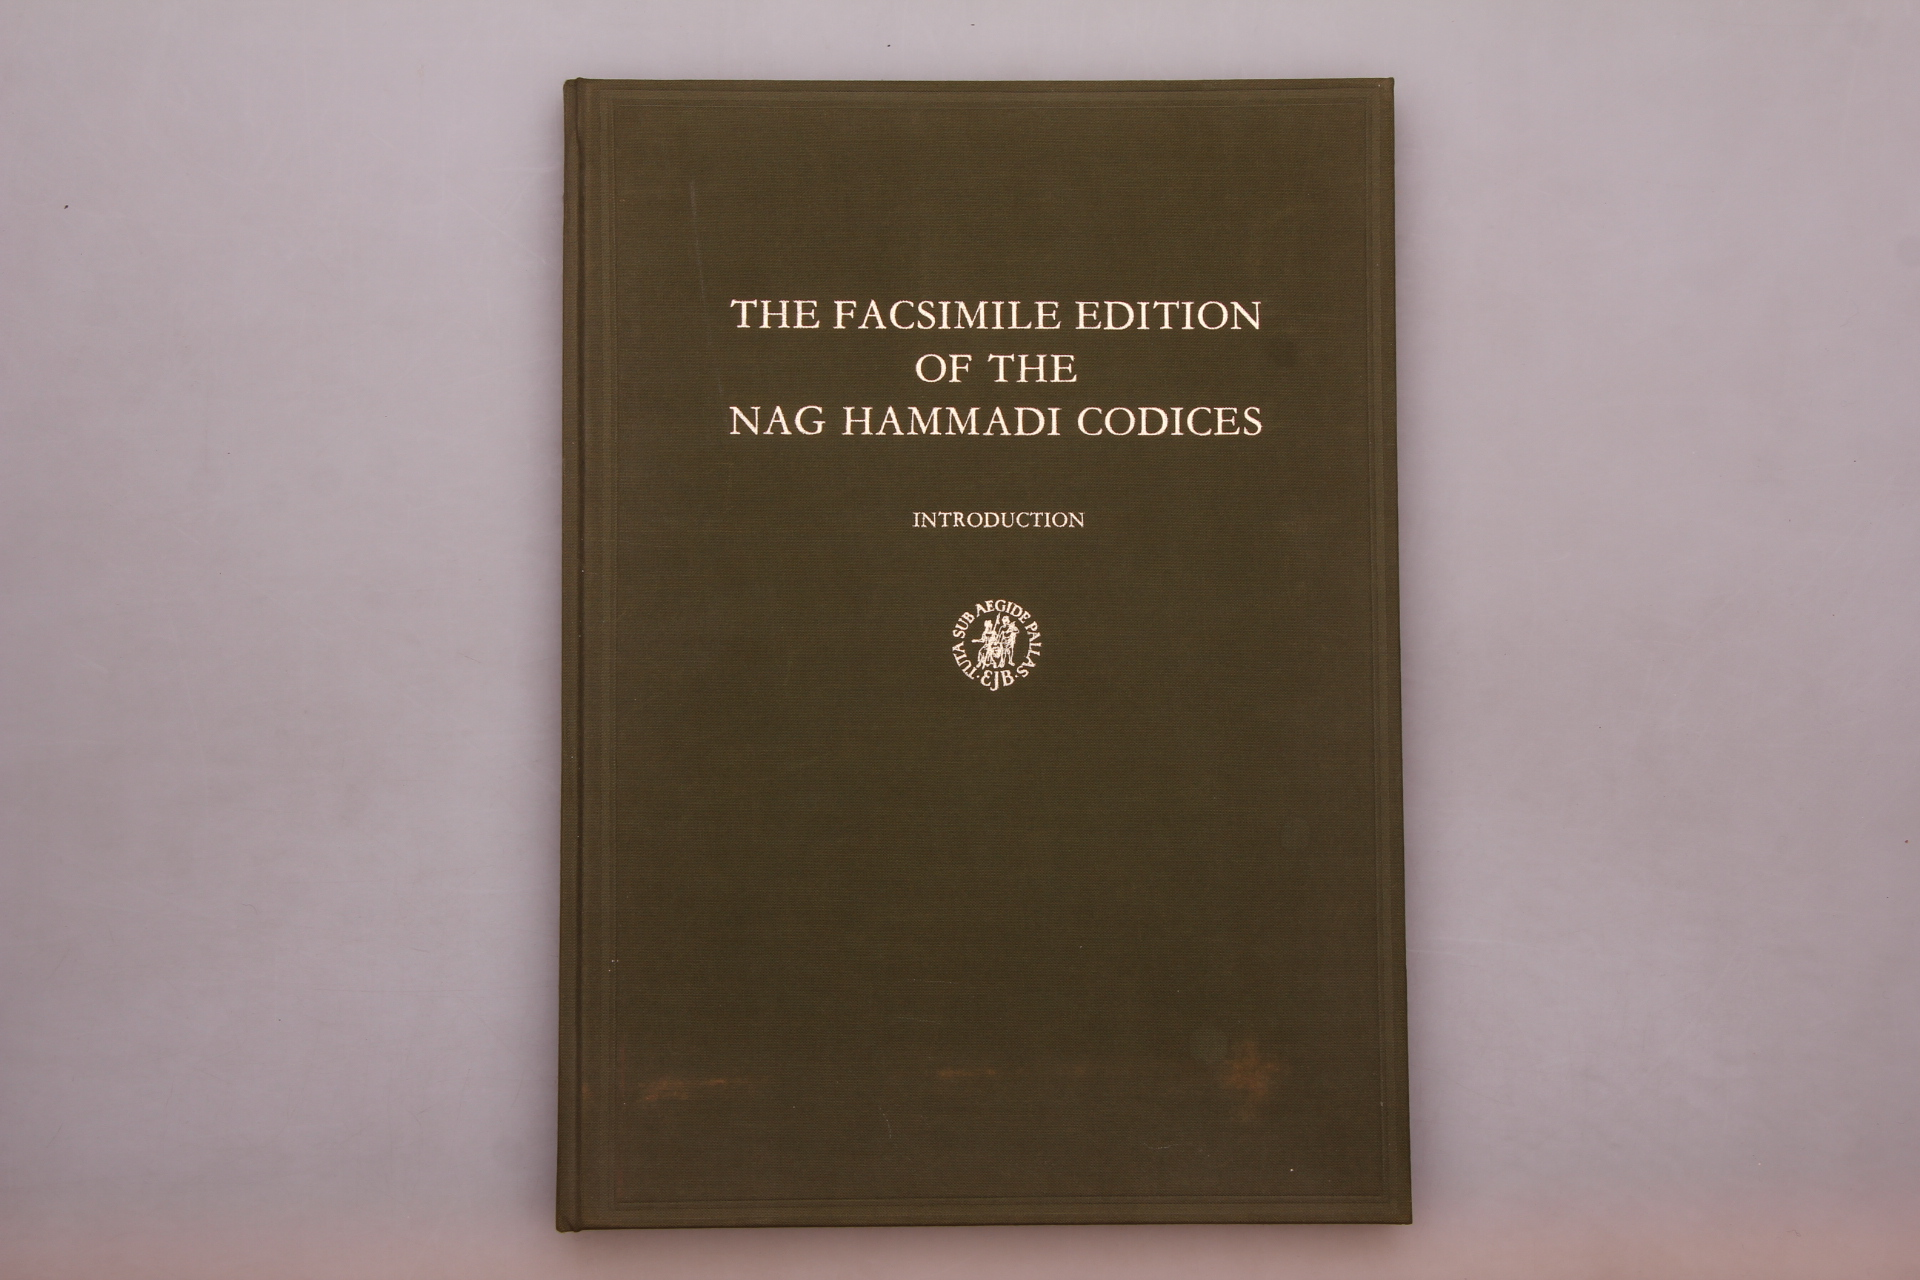 THE FACSIMILE EDITION OF THE NAG HAMMADI CODICES. Introduction